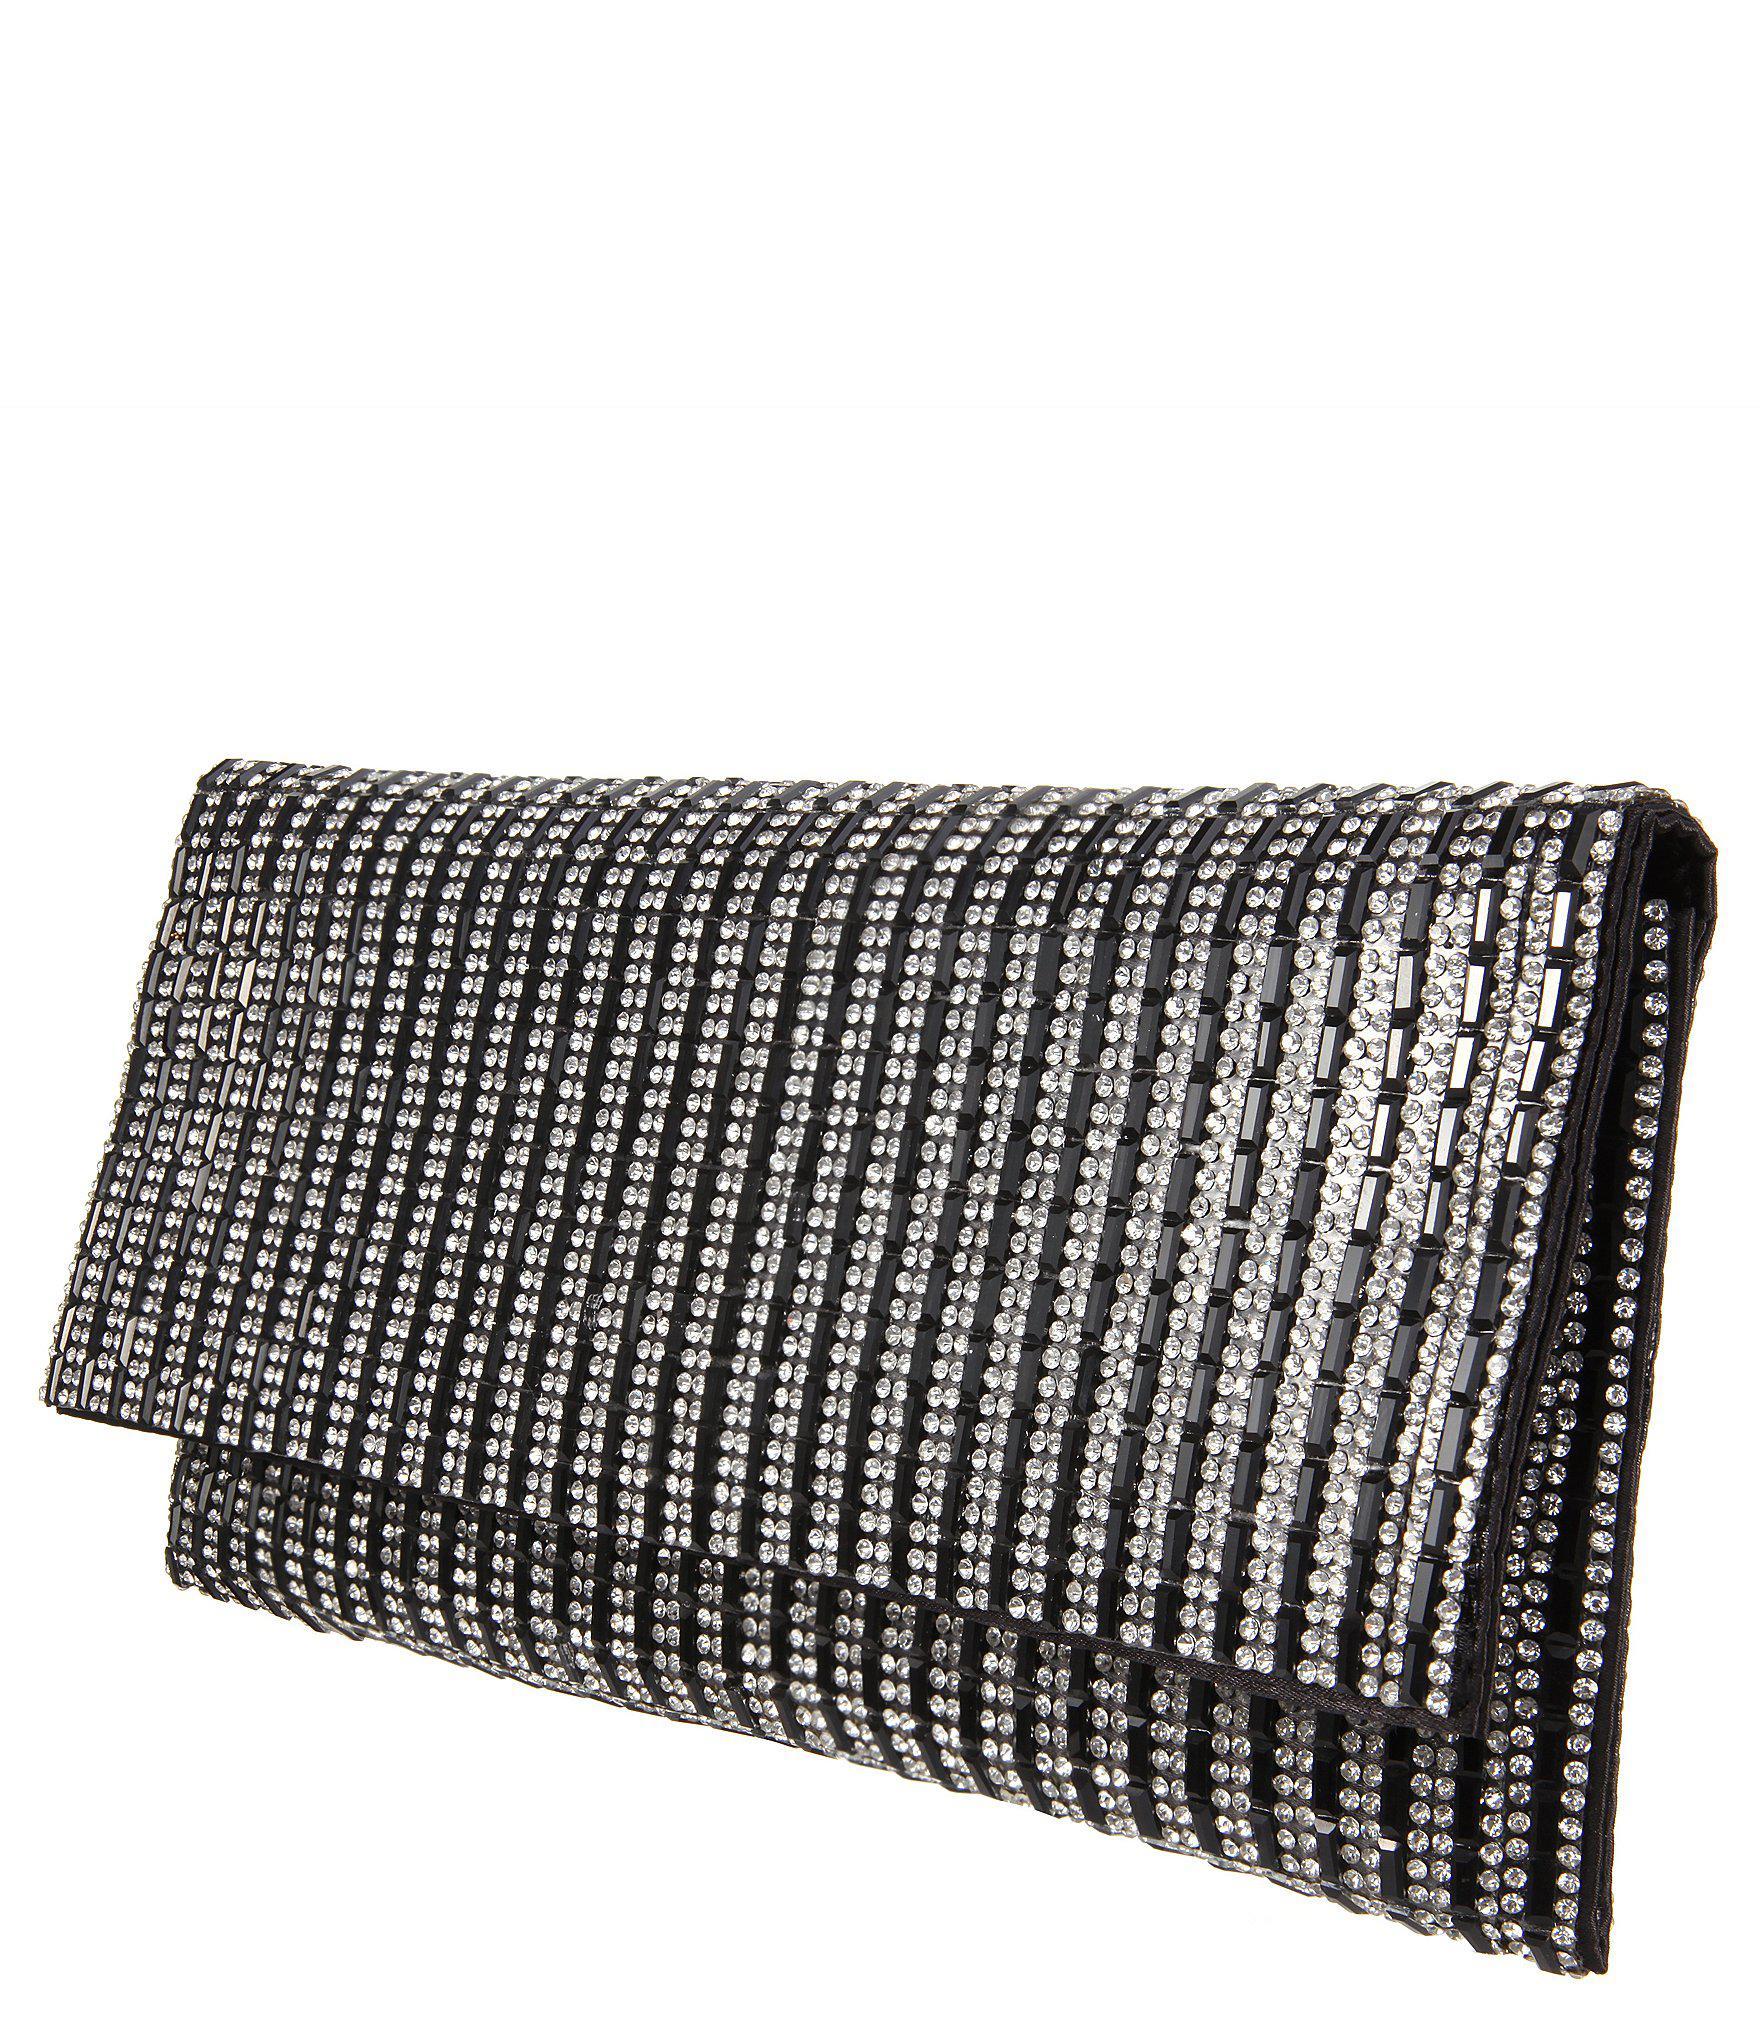 Lyst - Nina Stripe Pattern Crystal Clutch in Black - Save ... 15578a86fe